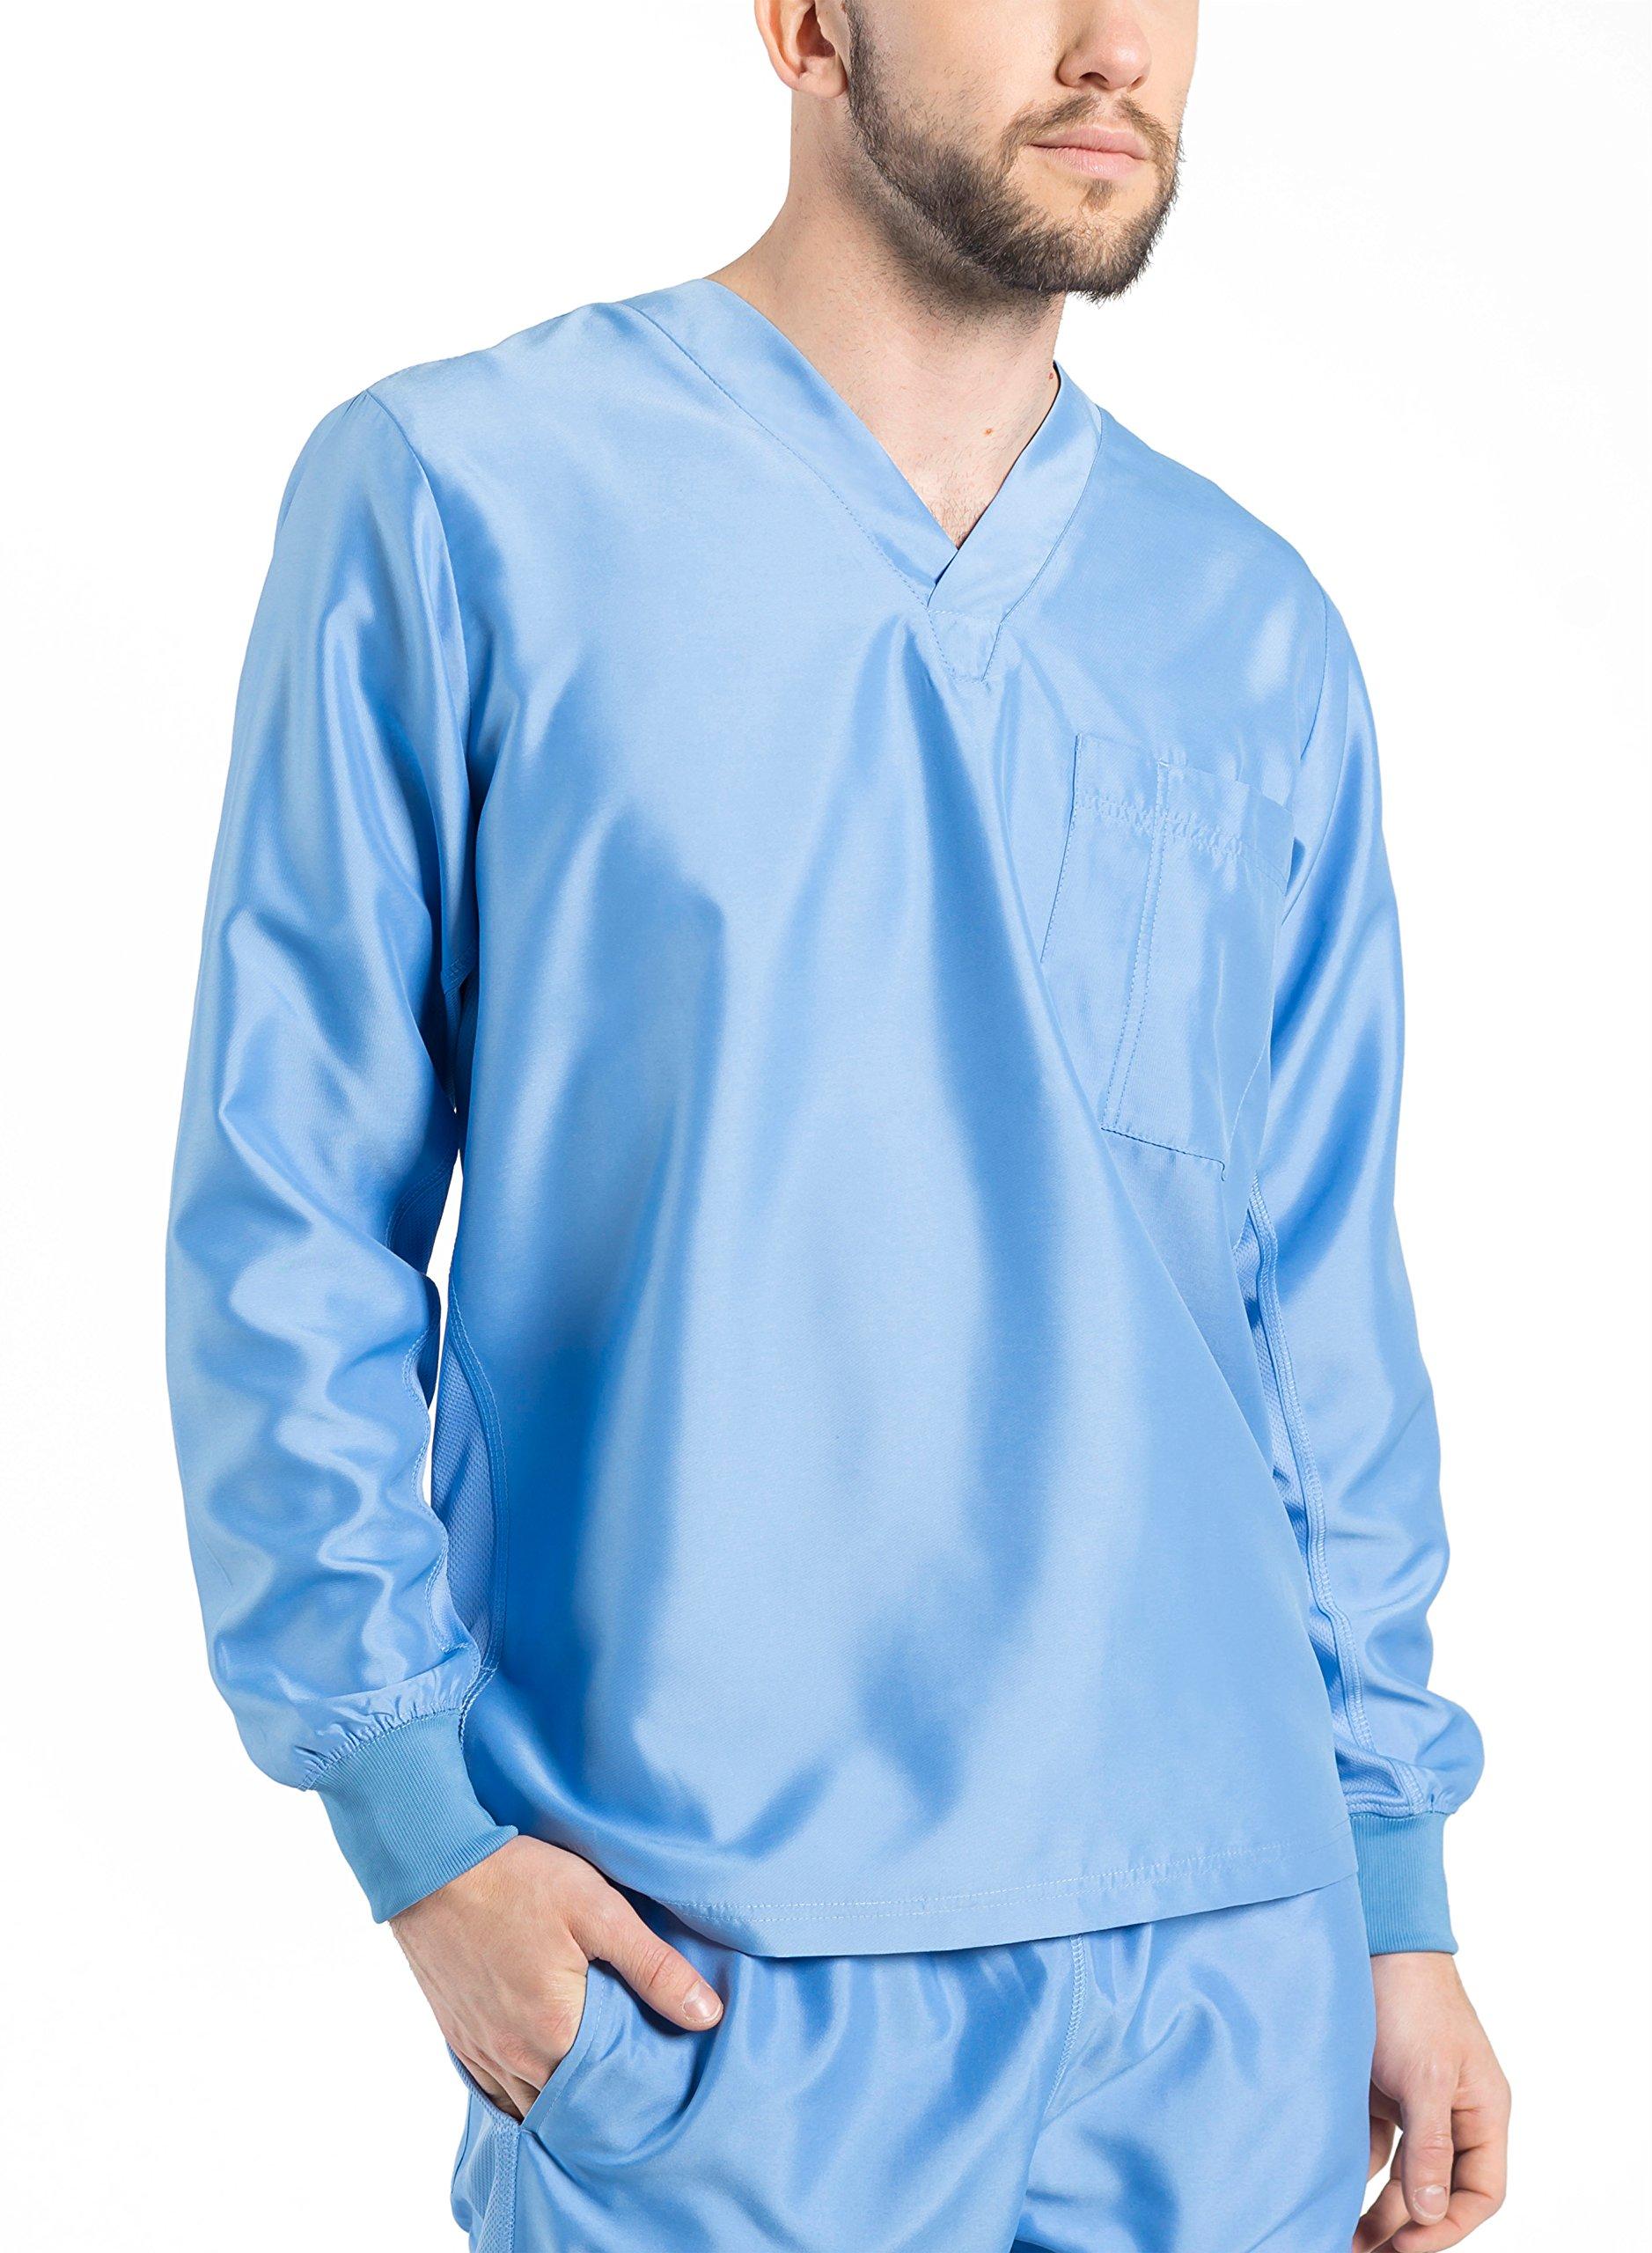 492374c9a39 TiScrubs Men's Long Sleeve Single Pocket Scrub Top (Small, Ceil Blue)